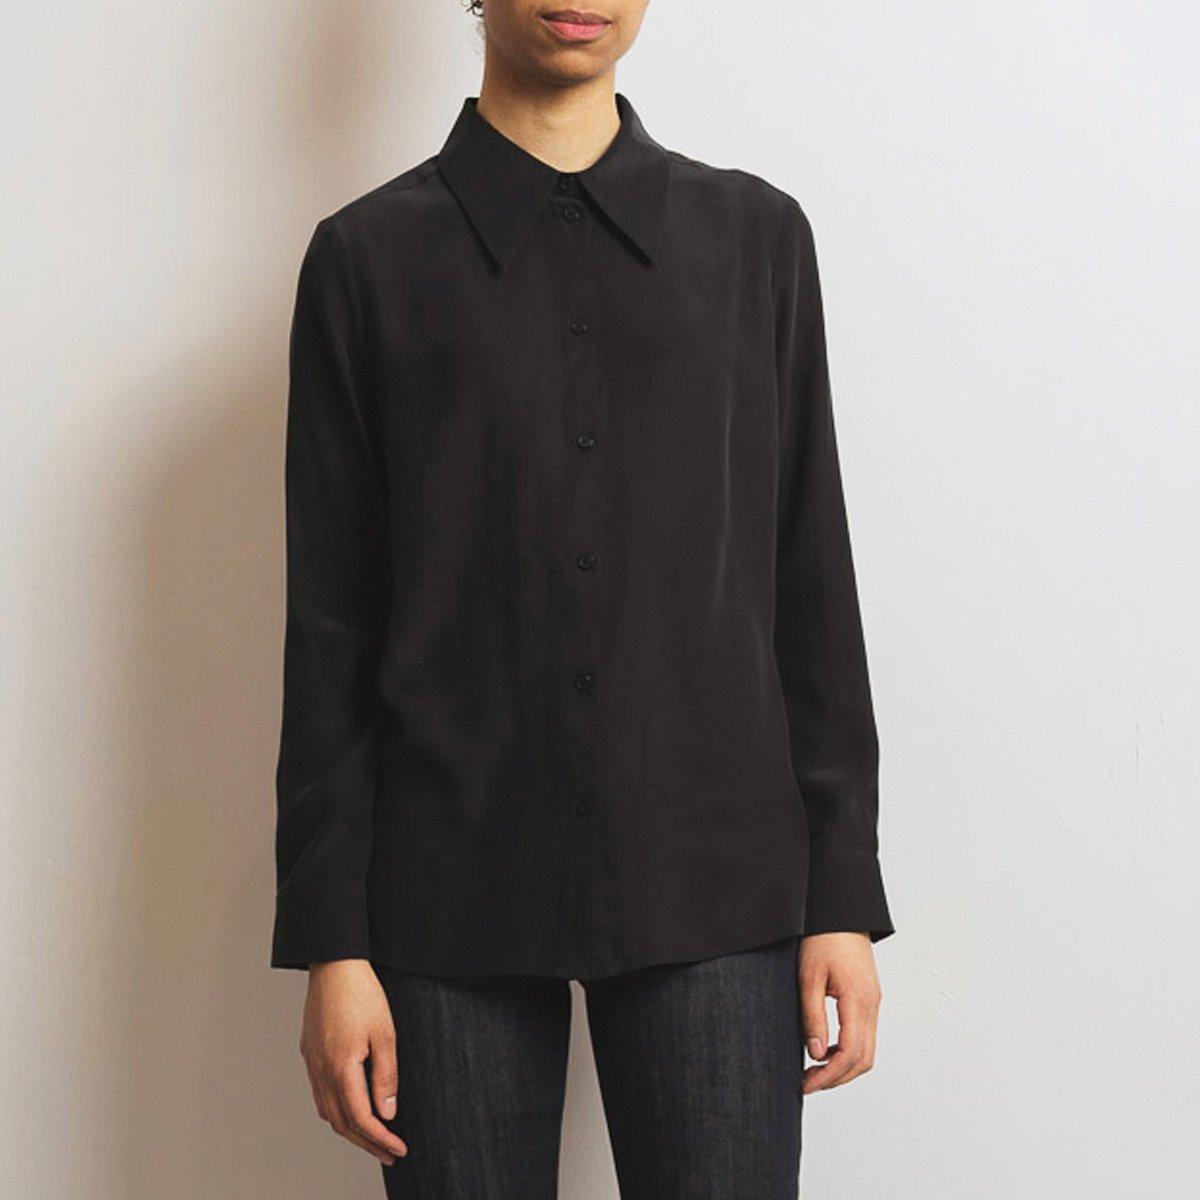 essential shirt in black silk